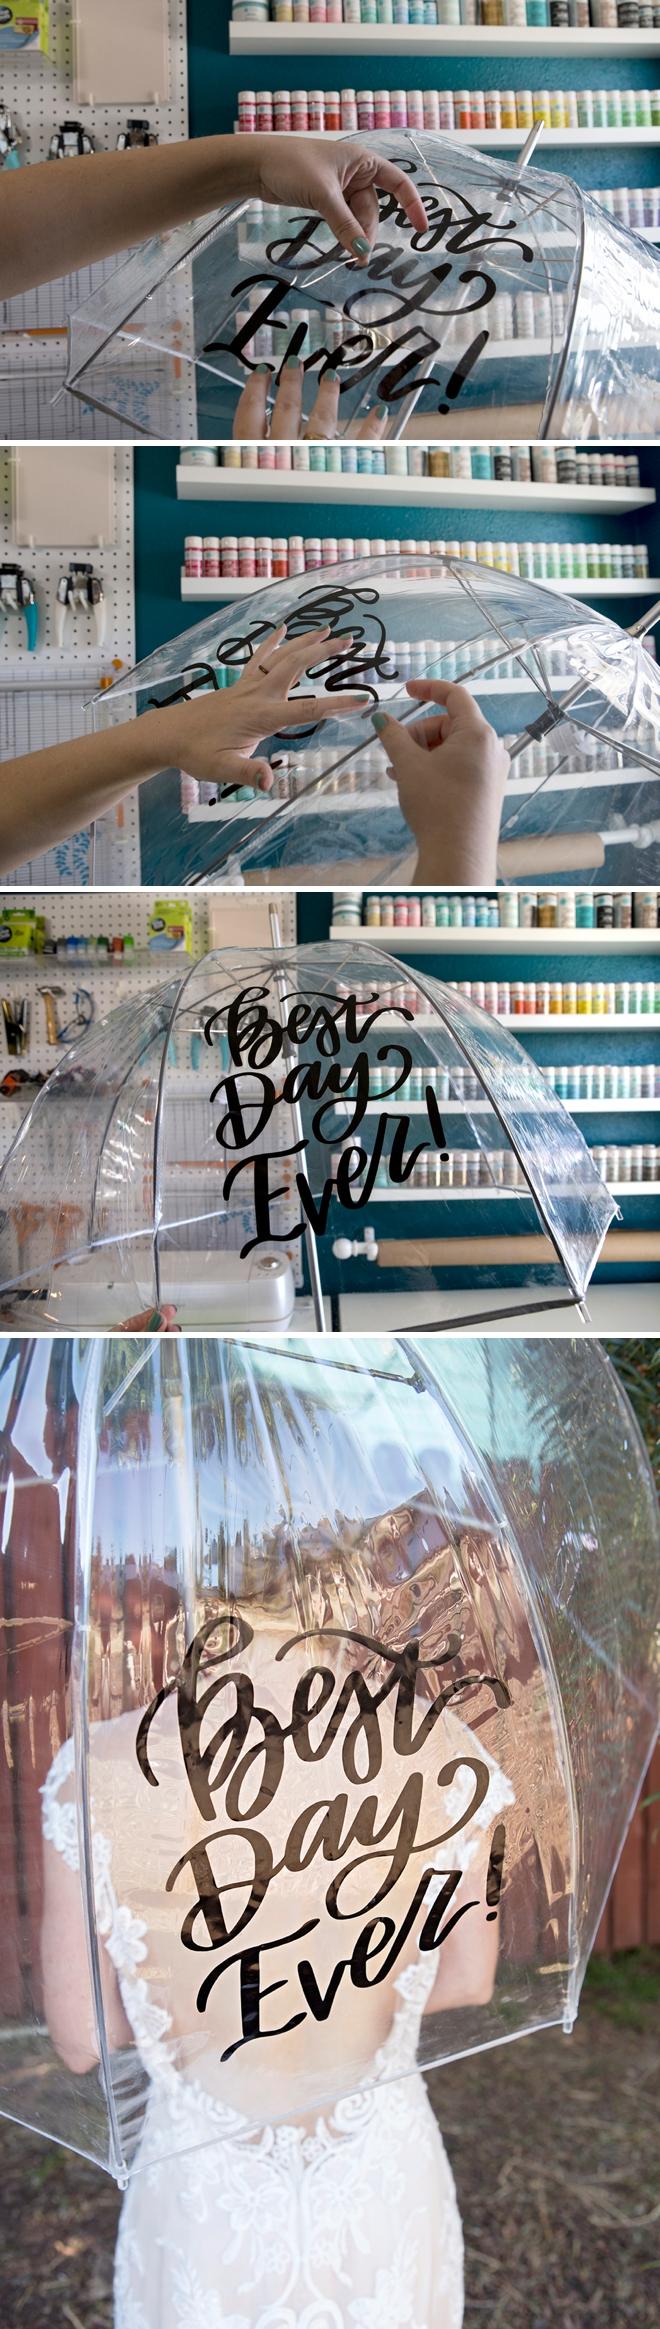 This DIY Best Day Ever wedding umbrella is darling!